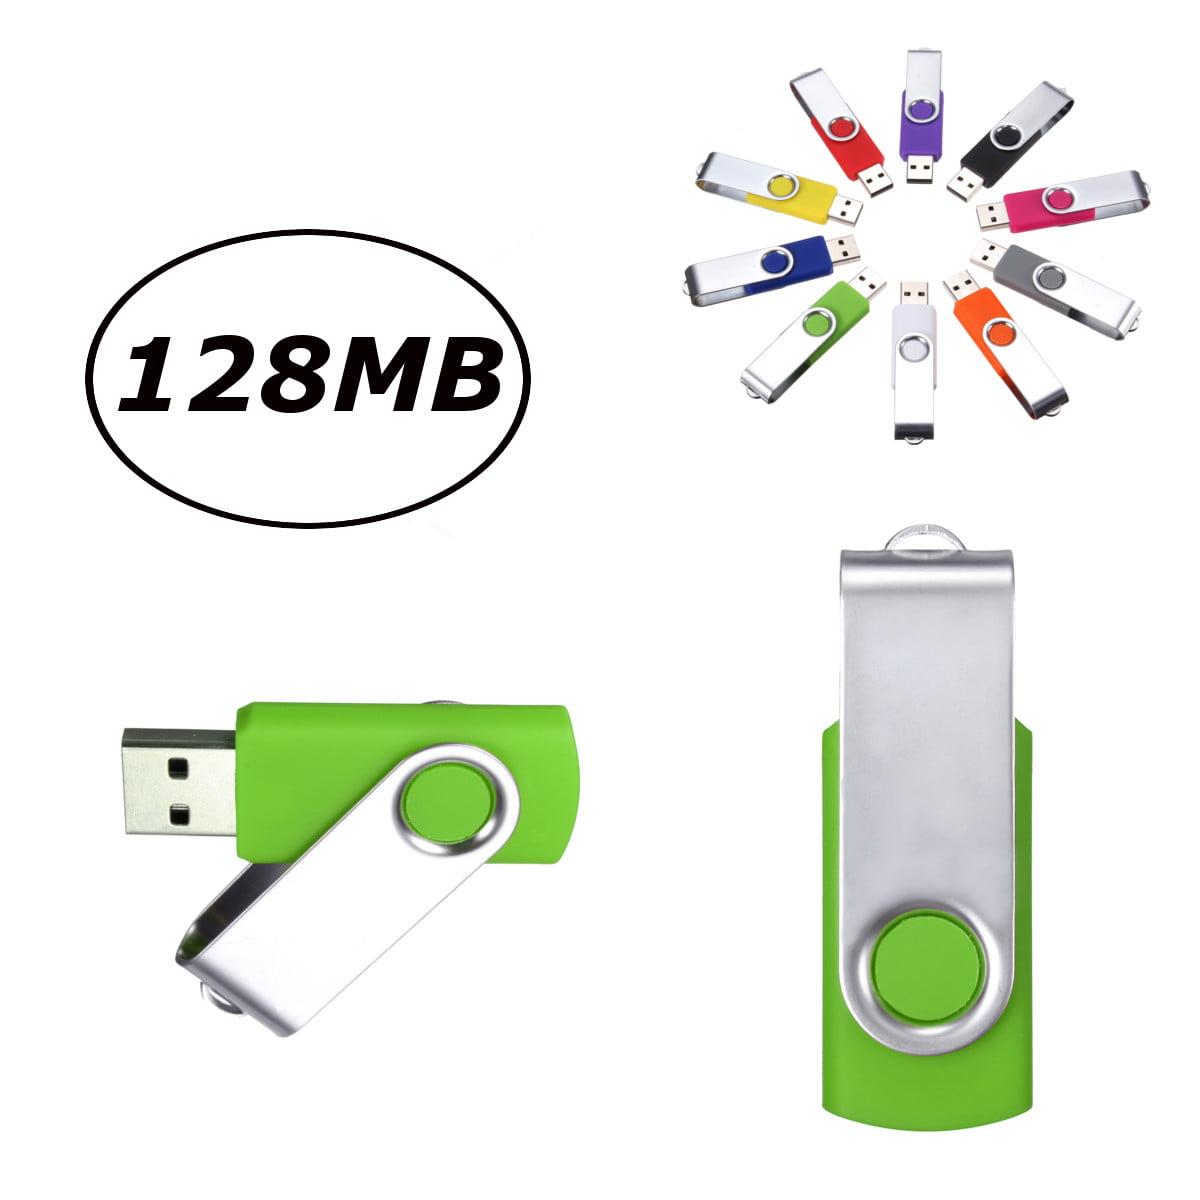 Foldable 128MB USB 2.0 Flash Memory Stick Pen Drive Storage Thumb USB 2.0 & USB 1.1 U Disk 15MB/sec & Write: 6 MB/sec